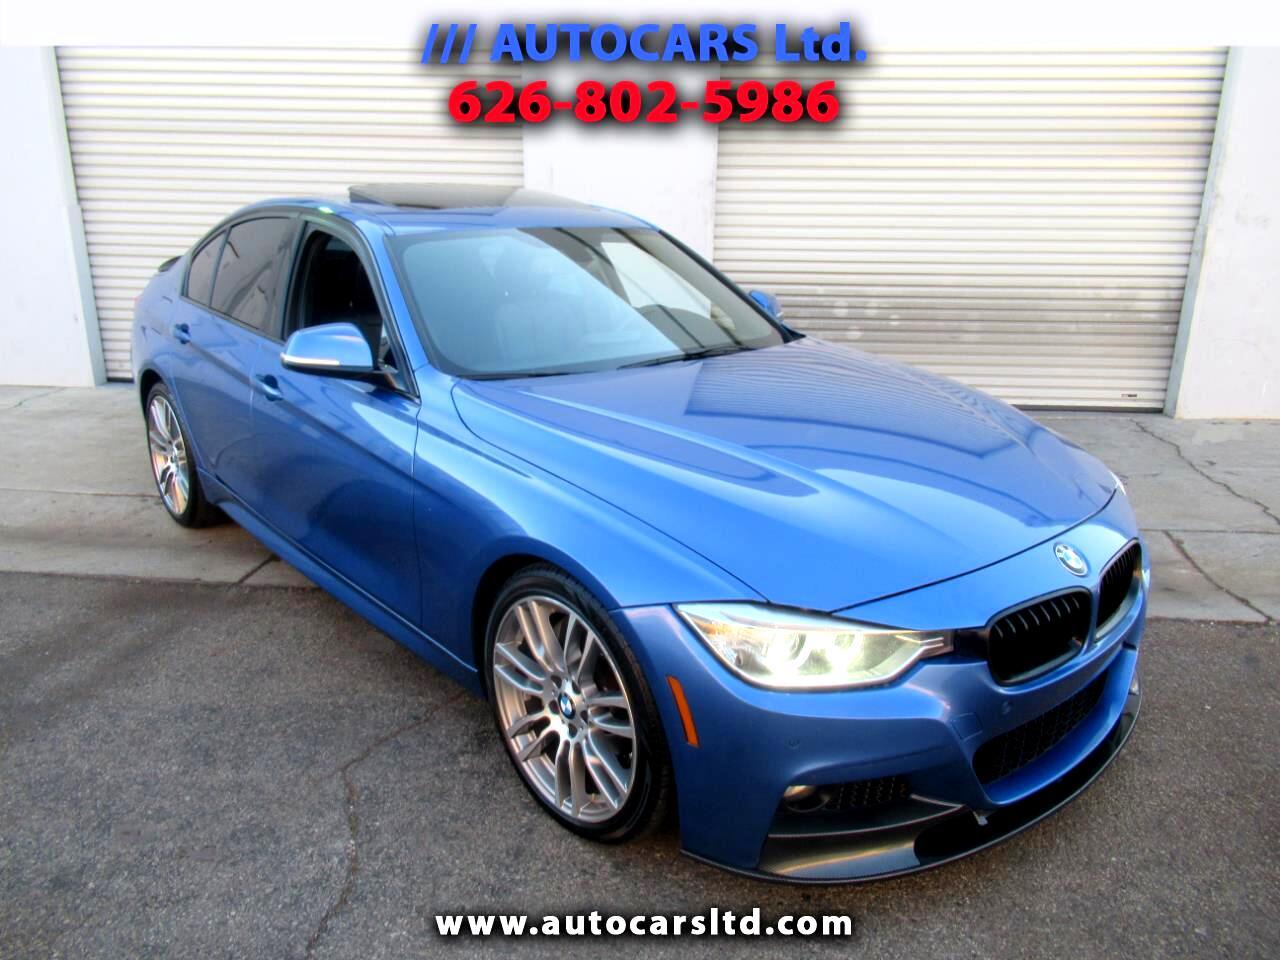 BMW 3 Series 4dr Sdn 335i RWD 2015